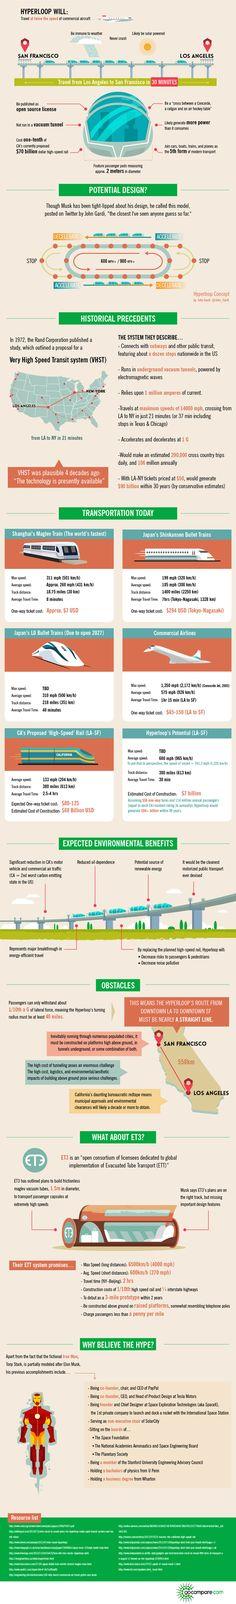 Infographic: Hyperloop - speedy transportation system to be unveiled Aug 12, 2013.  elon musk, hyperloop, green transportation, sustainable design, green design, maglev, magnetic levitation, public transportation, train, pneumatic tube